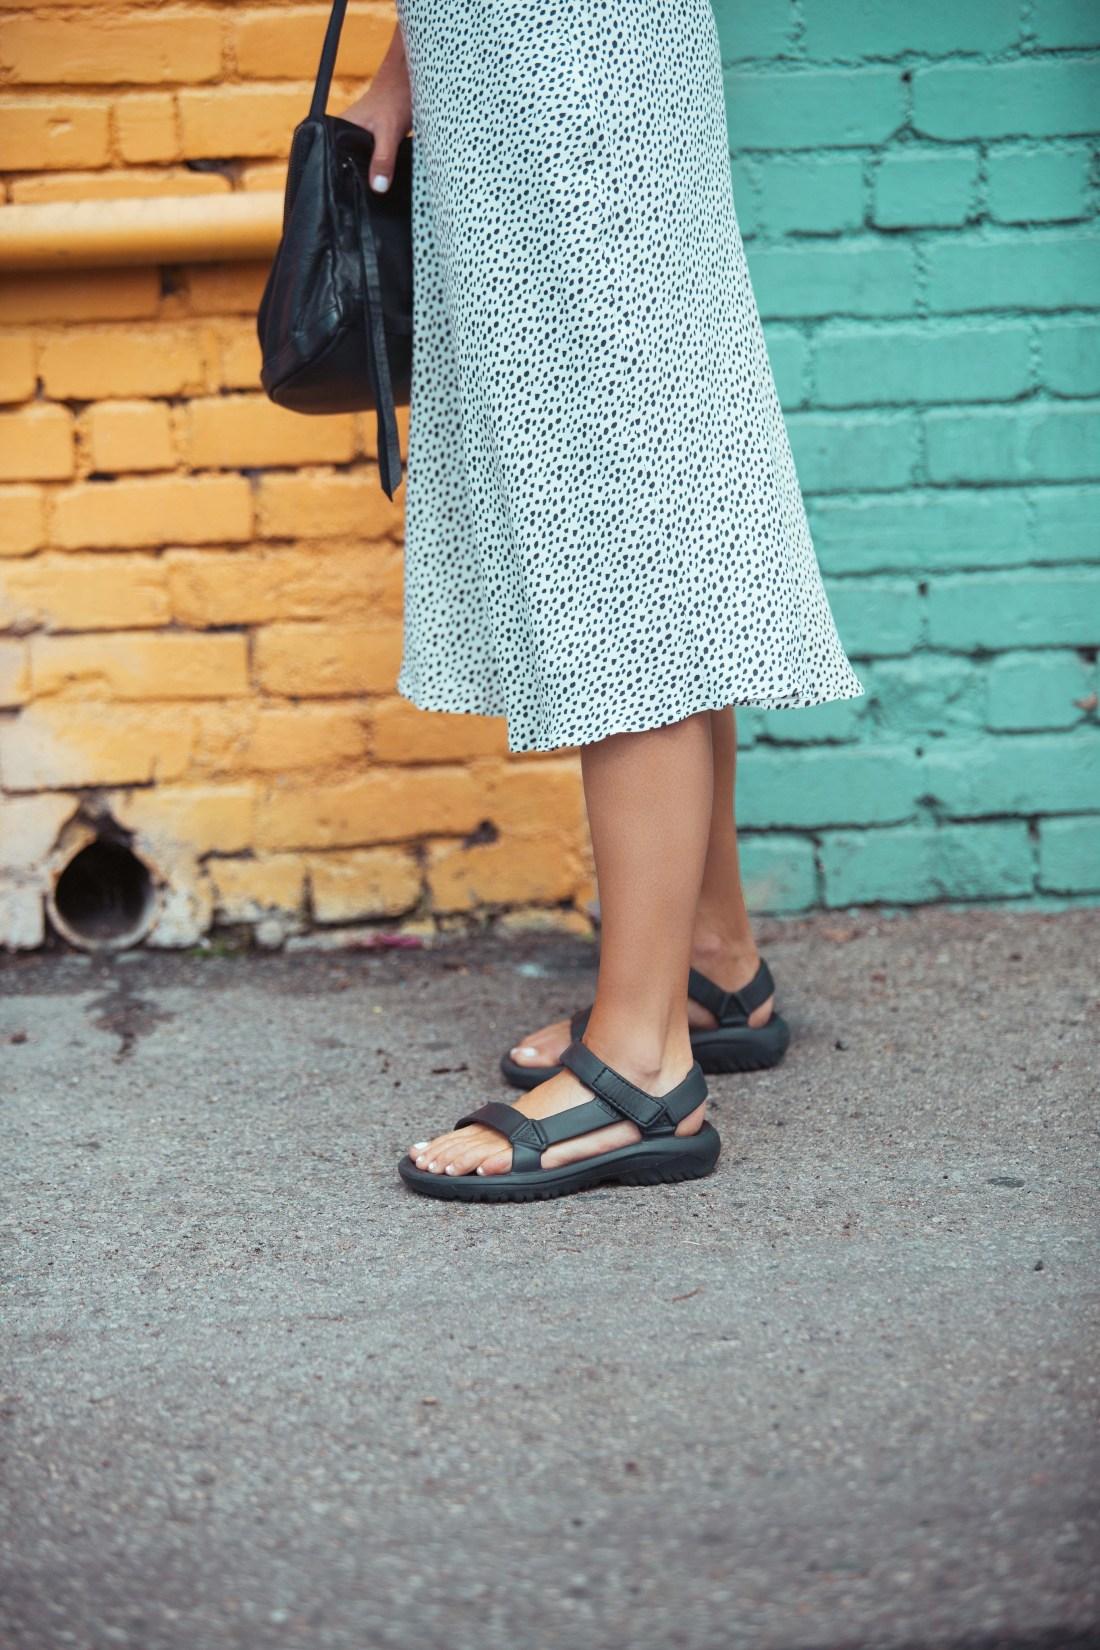 Leopard spotted midi skirt | Black rubber tevas